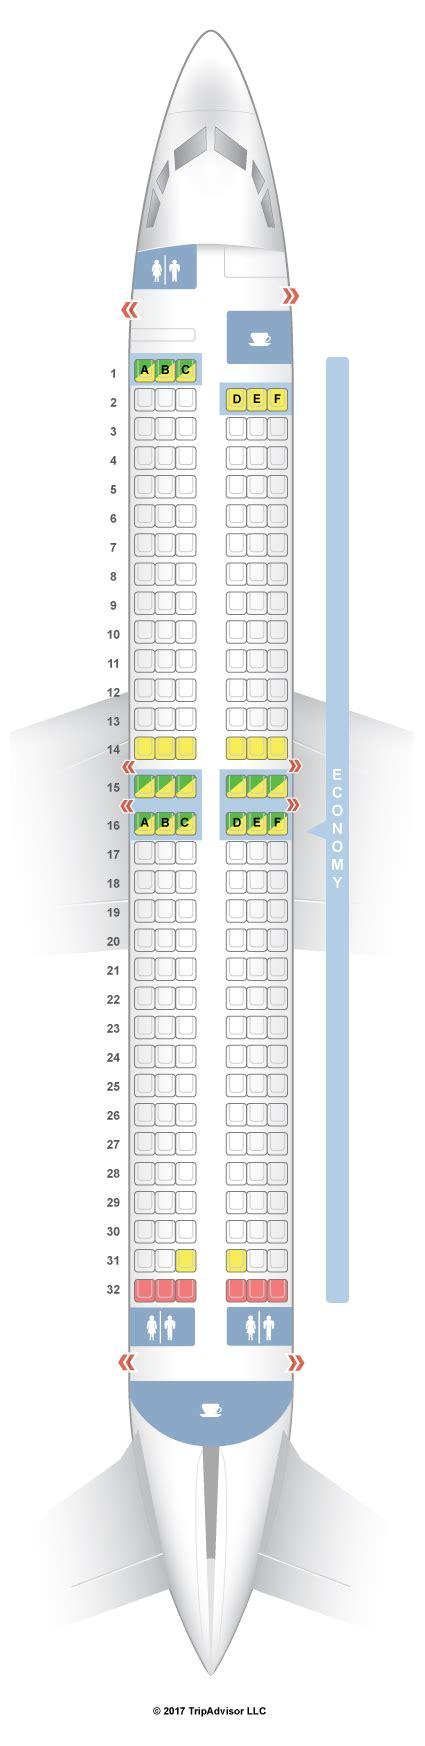 transavia seats seatguru seat map transavia airlines boeing 737 800 738